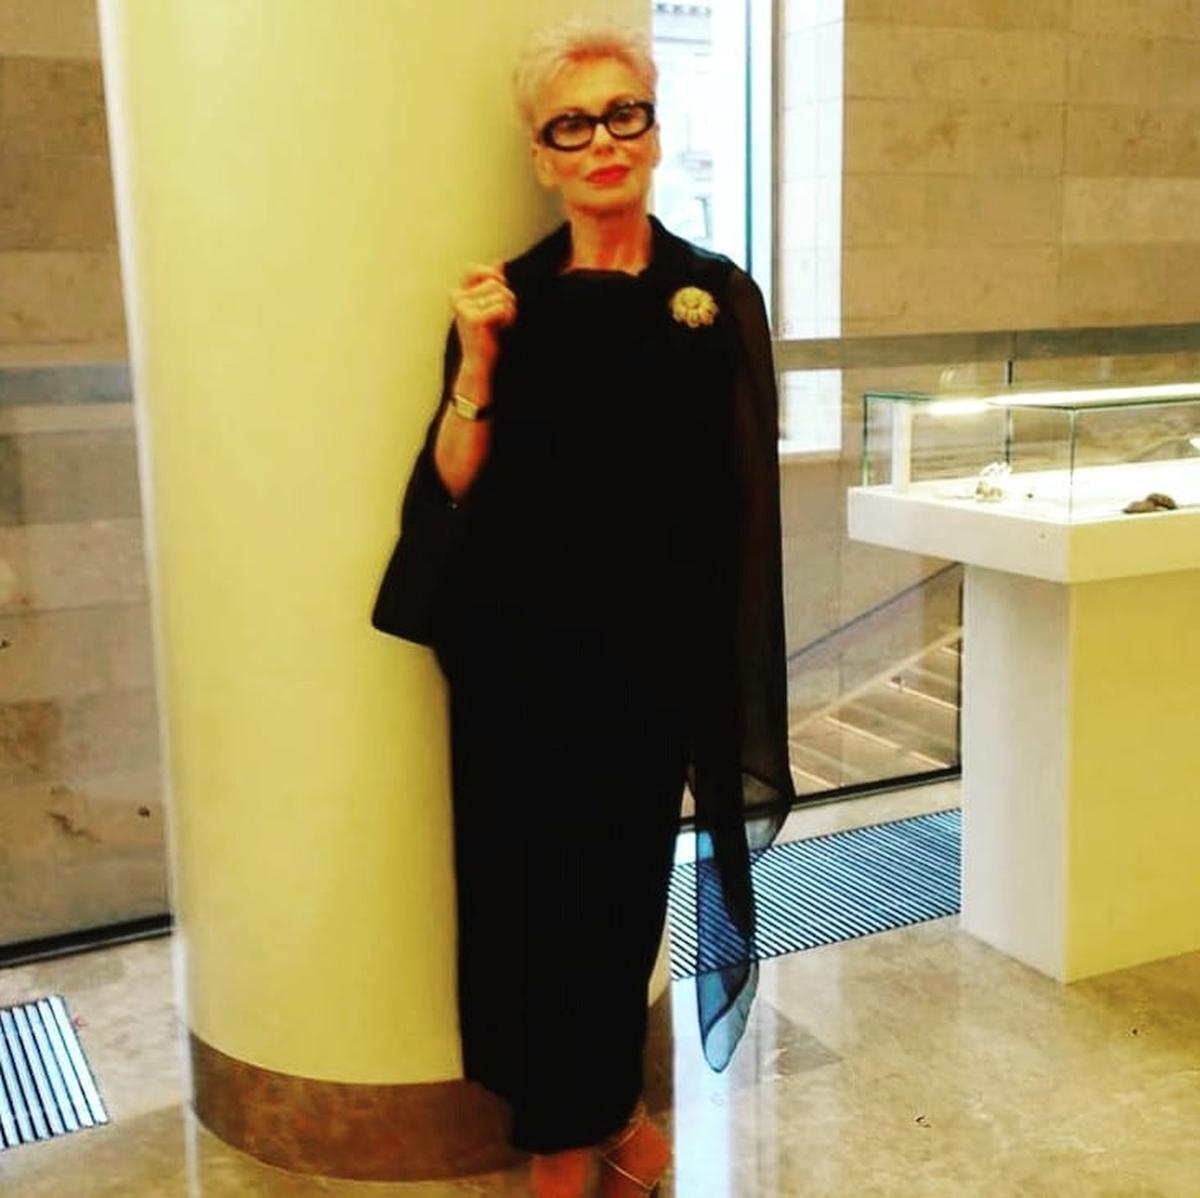 Irina Ponarovskaya and other celebrities who returned foster children